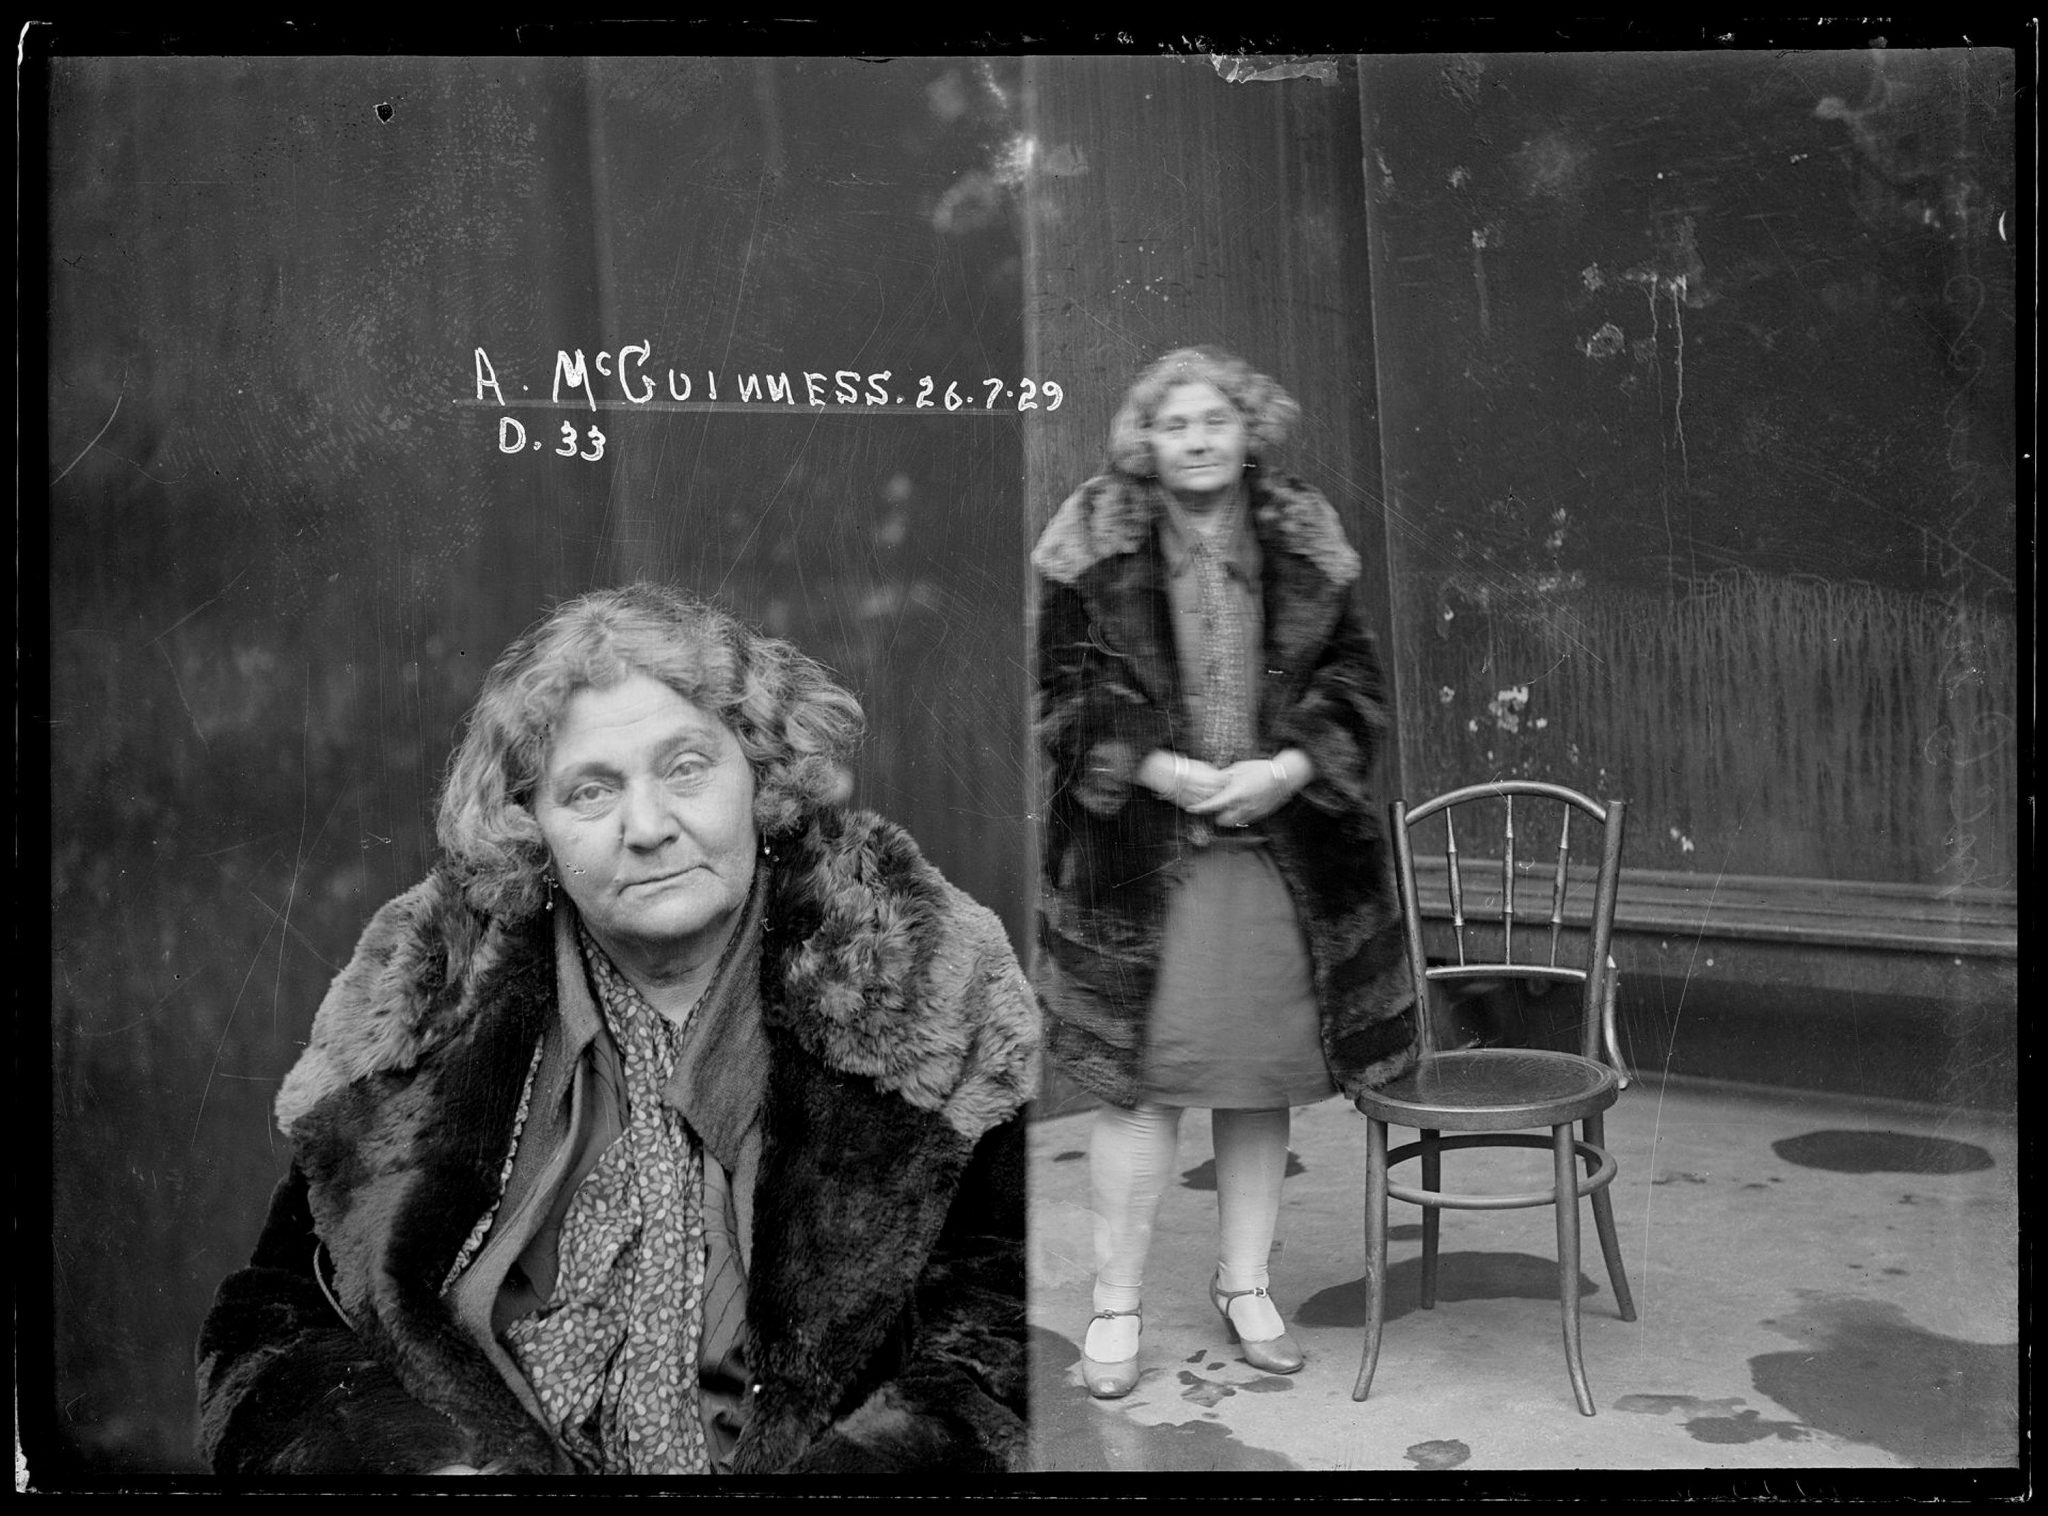 Vintage-Australian-Mugshot-Photograph-27